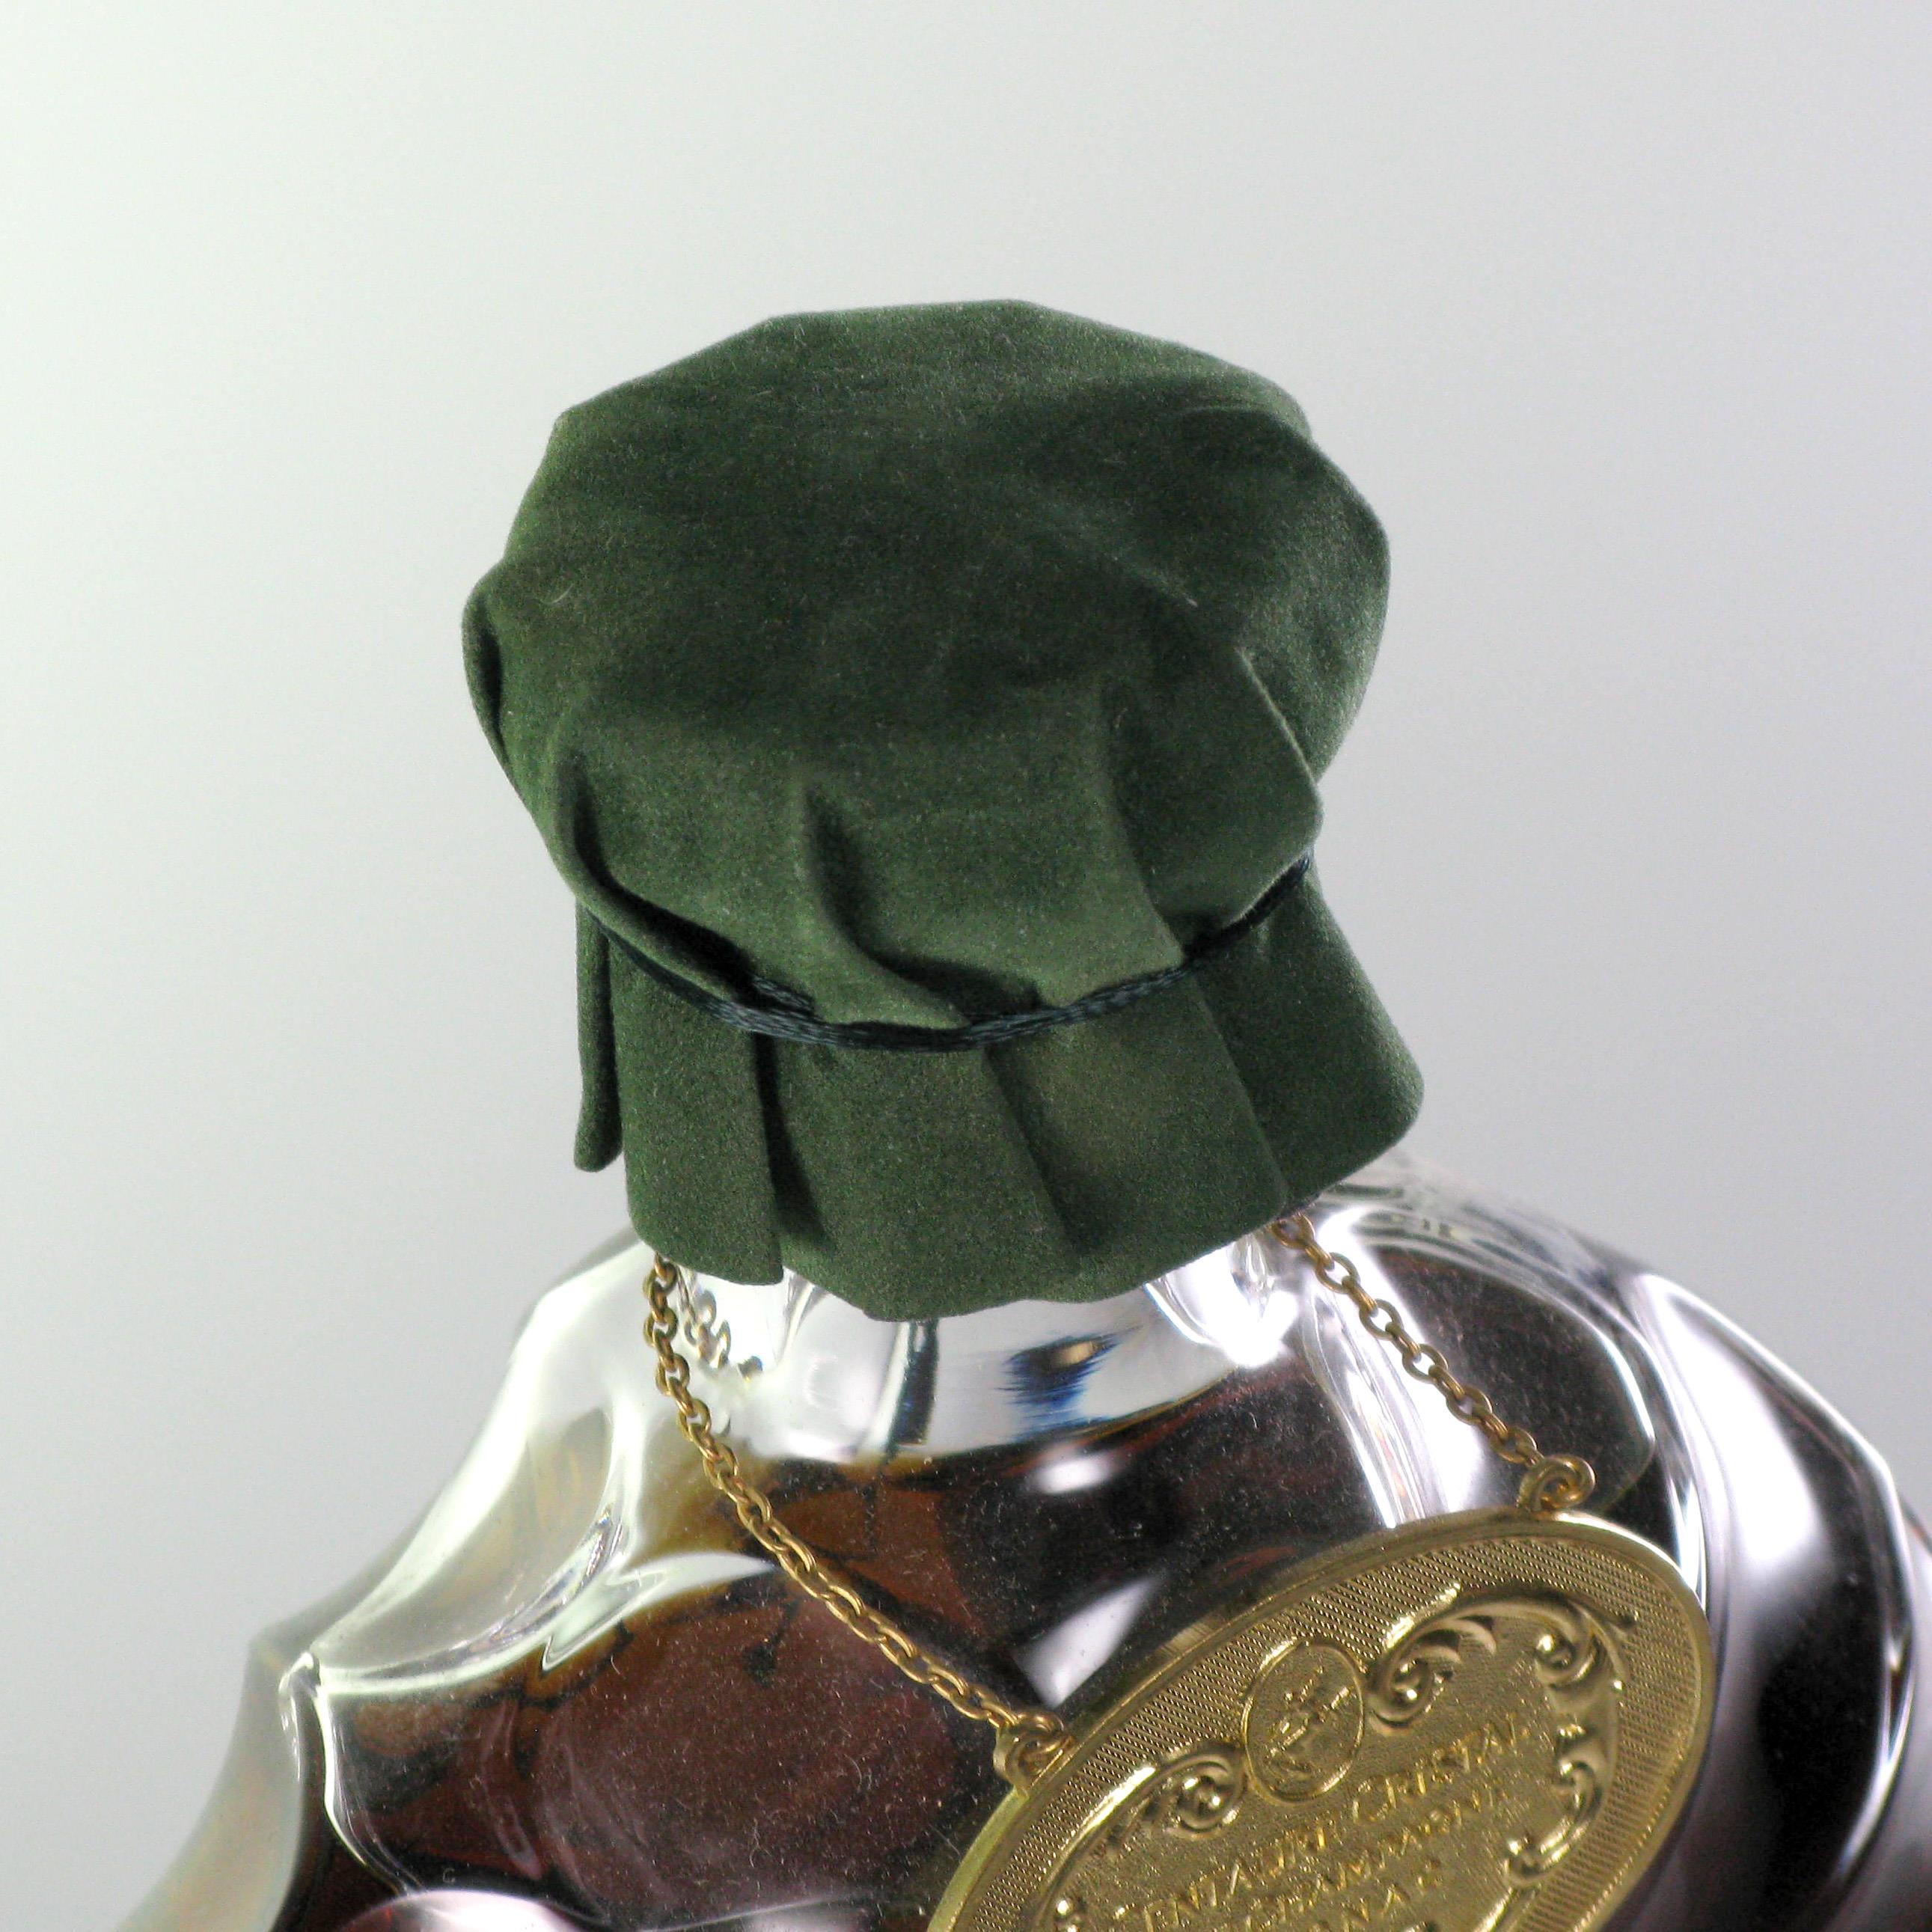 Remy Martin Centaure Cognac Baccarat Decanter Bot.1991